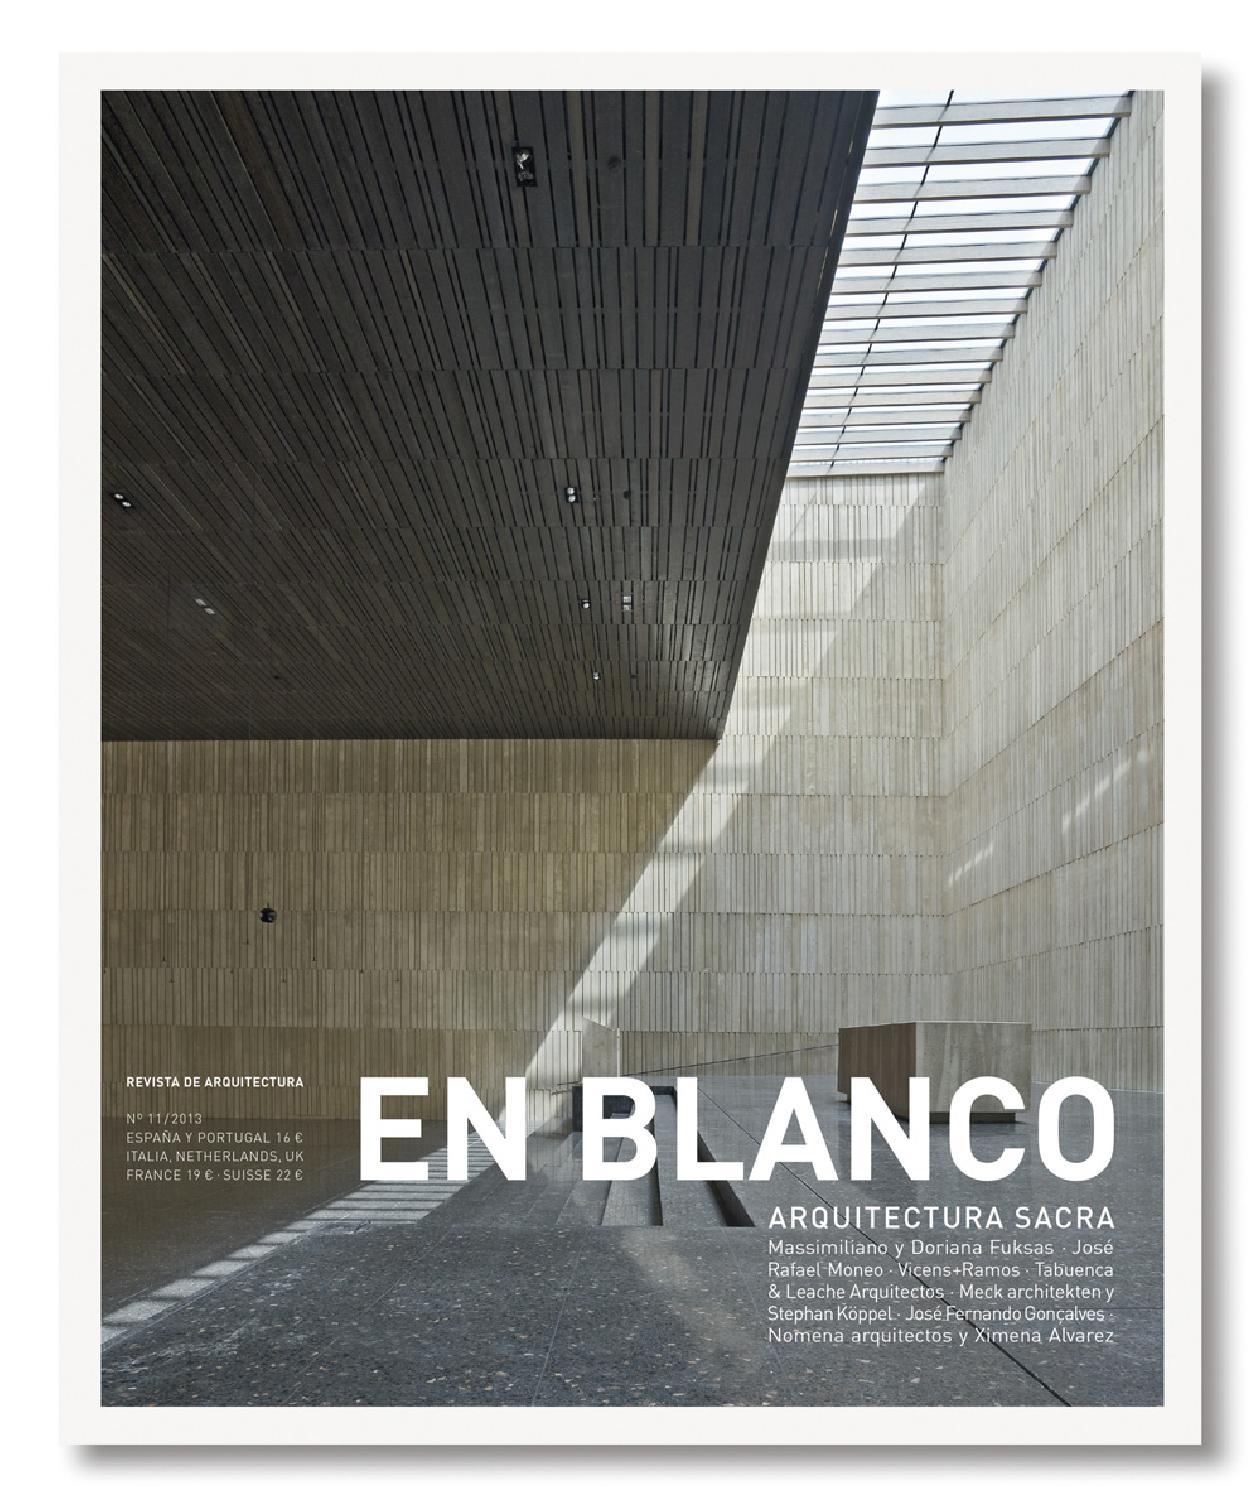 Eb 11 arquitectura sacra by tc cuadernos issuu for Arquitectura sacro